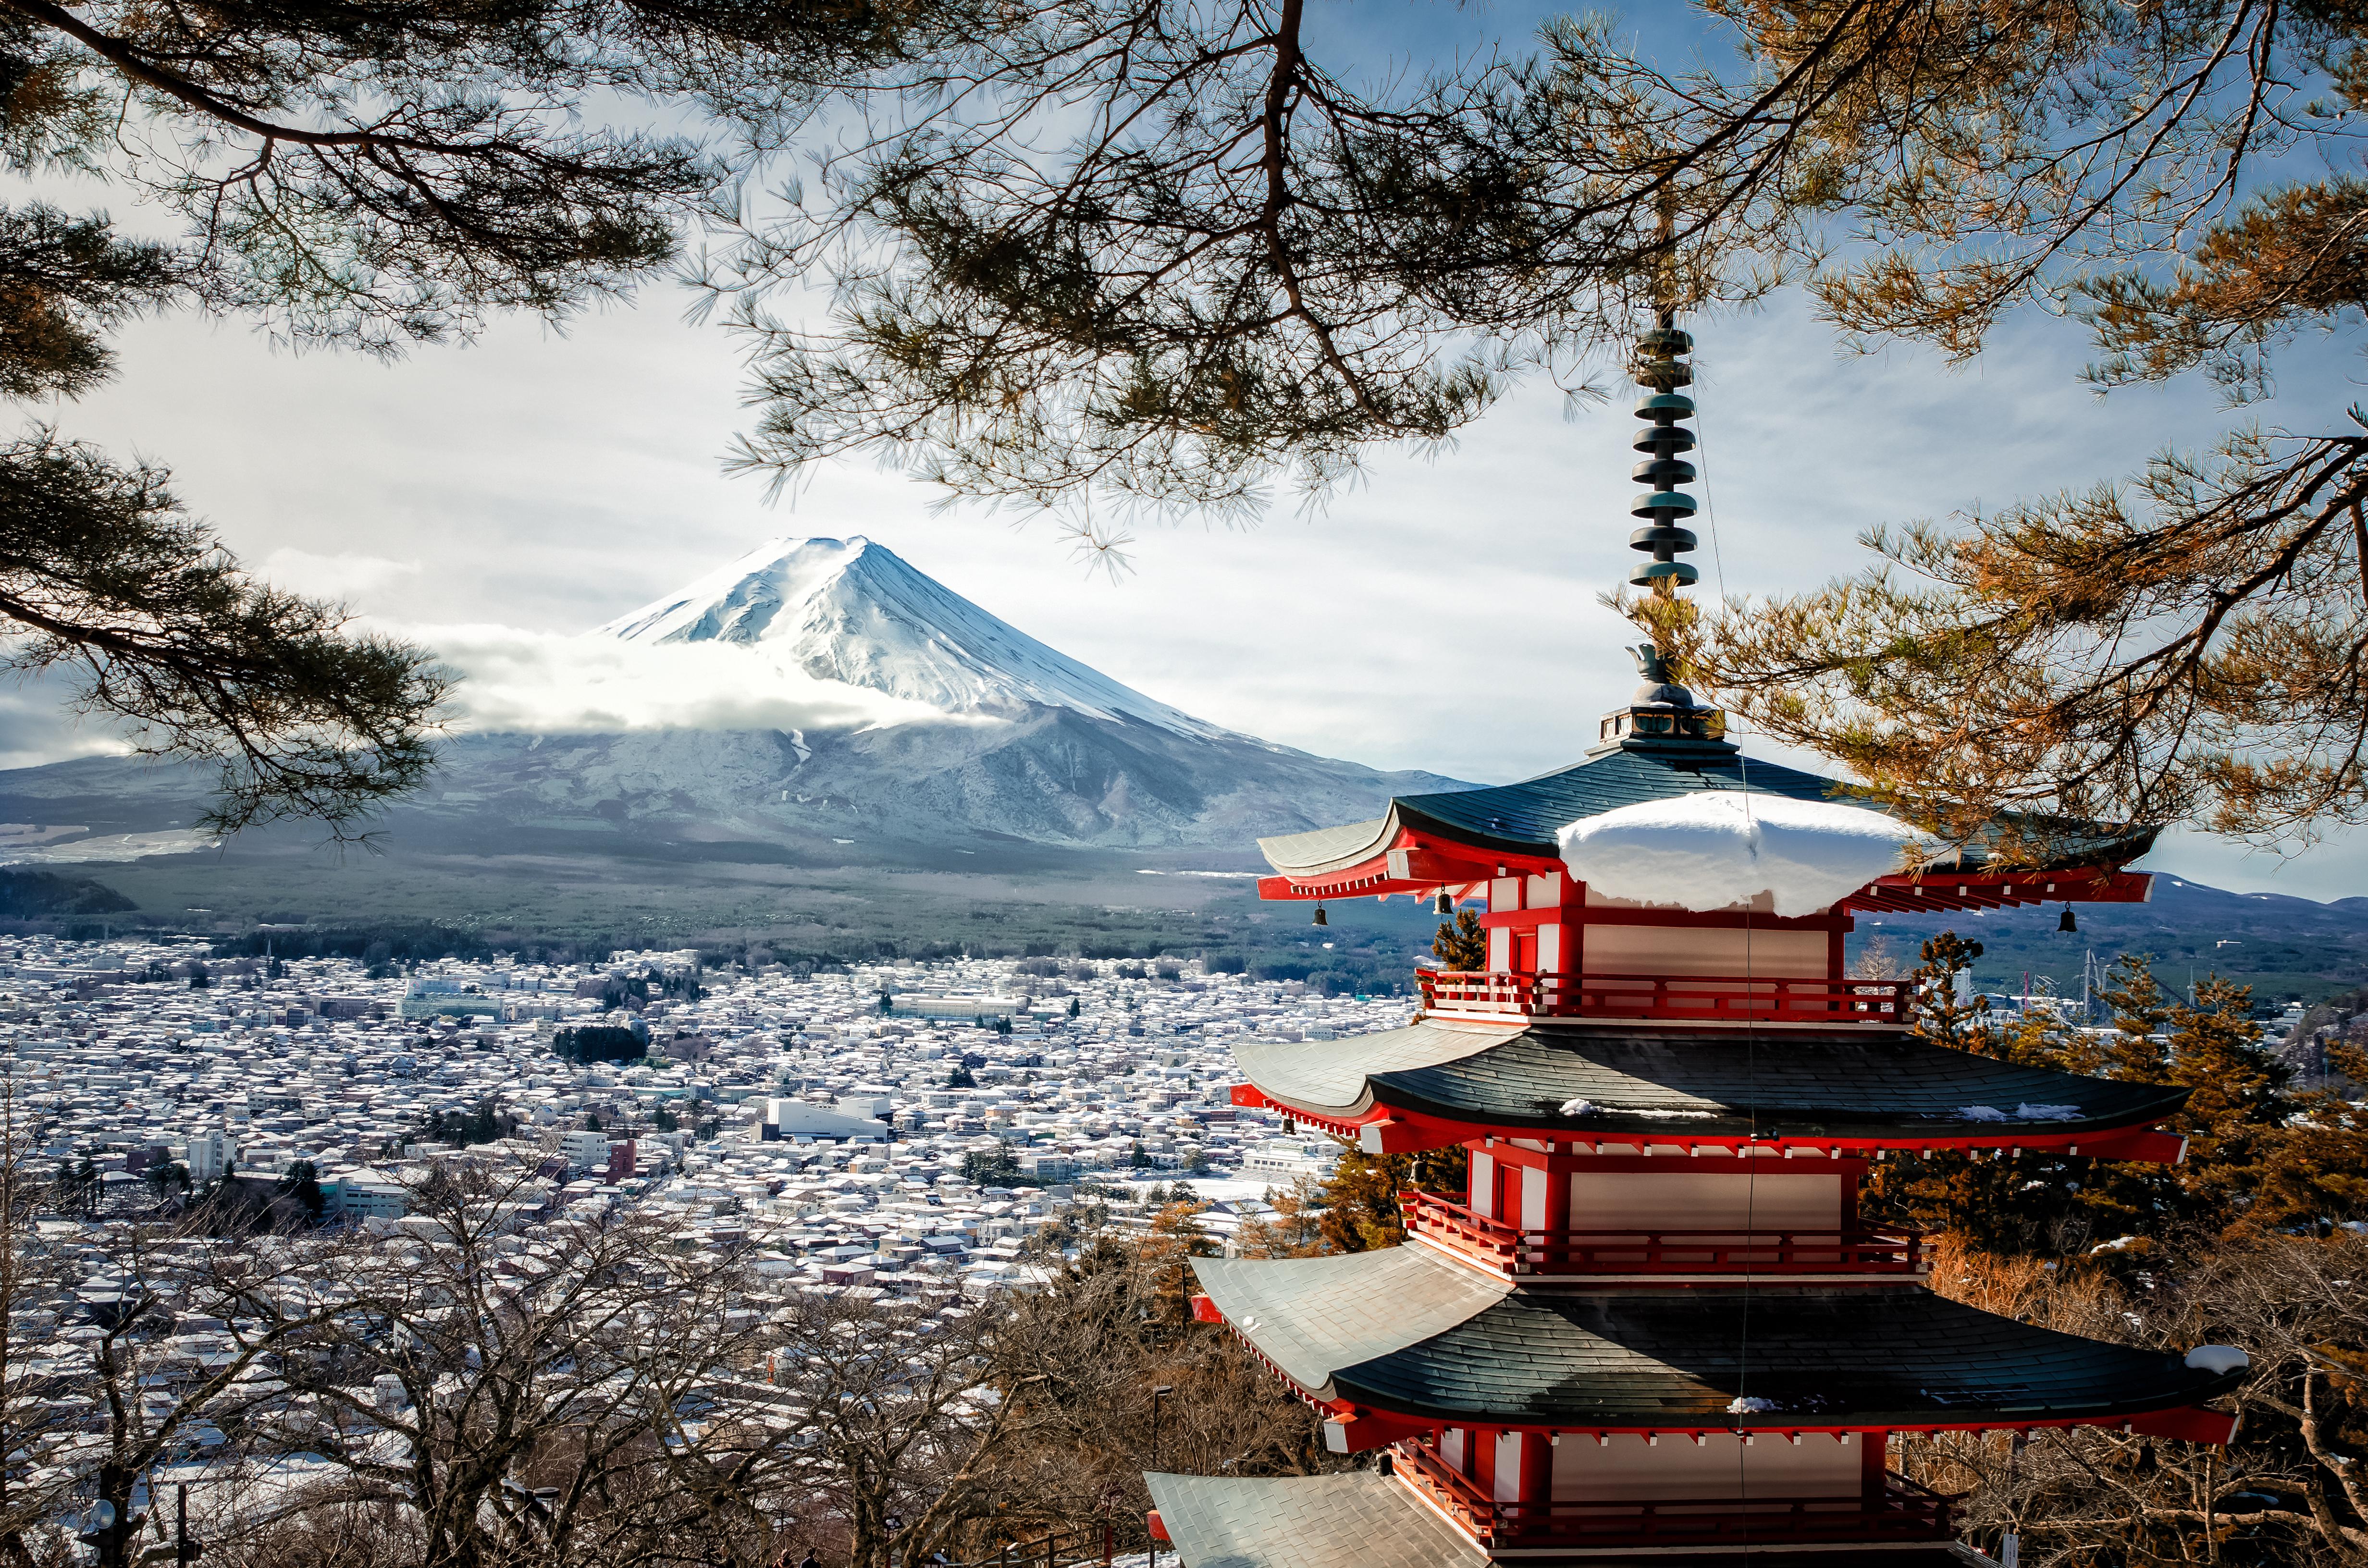 Japan - Fuji Mountain